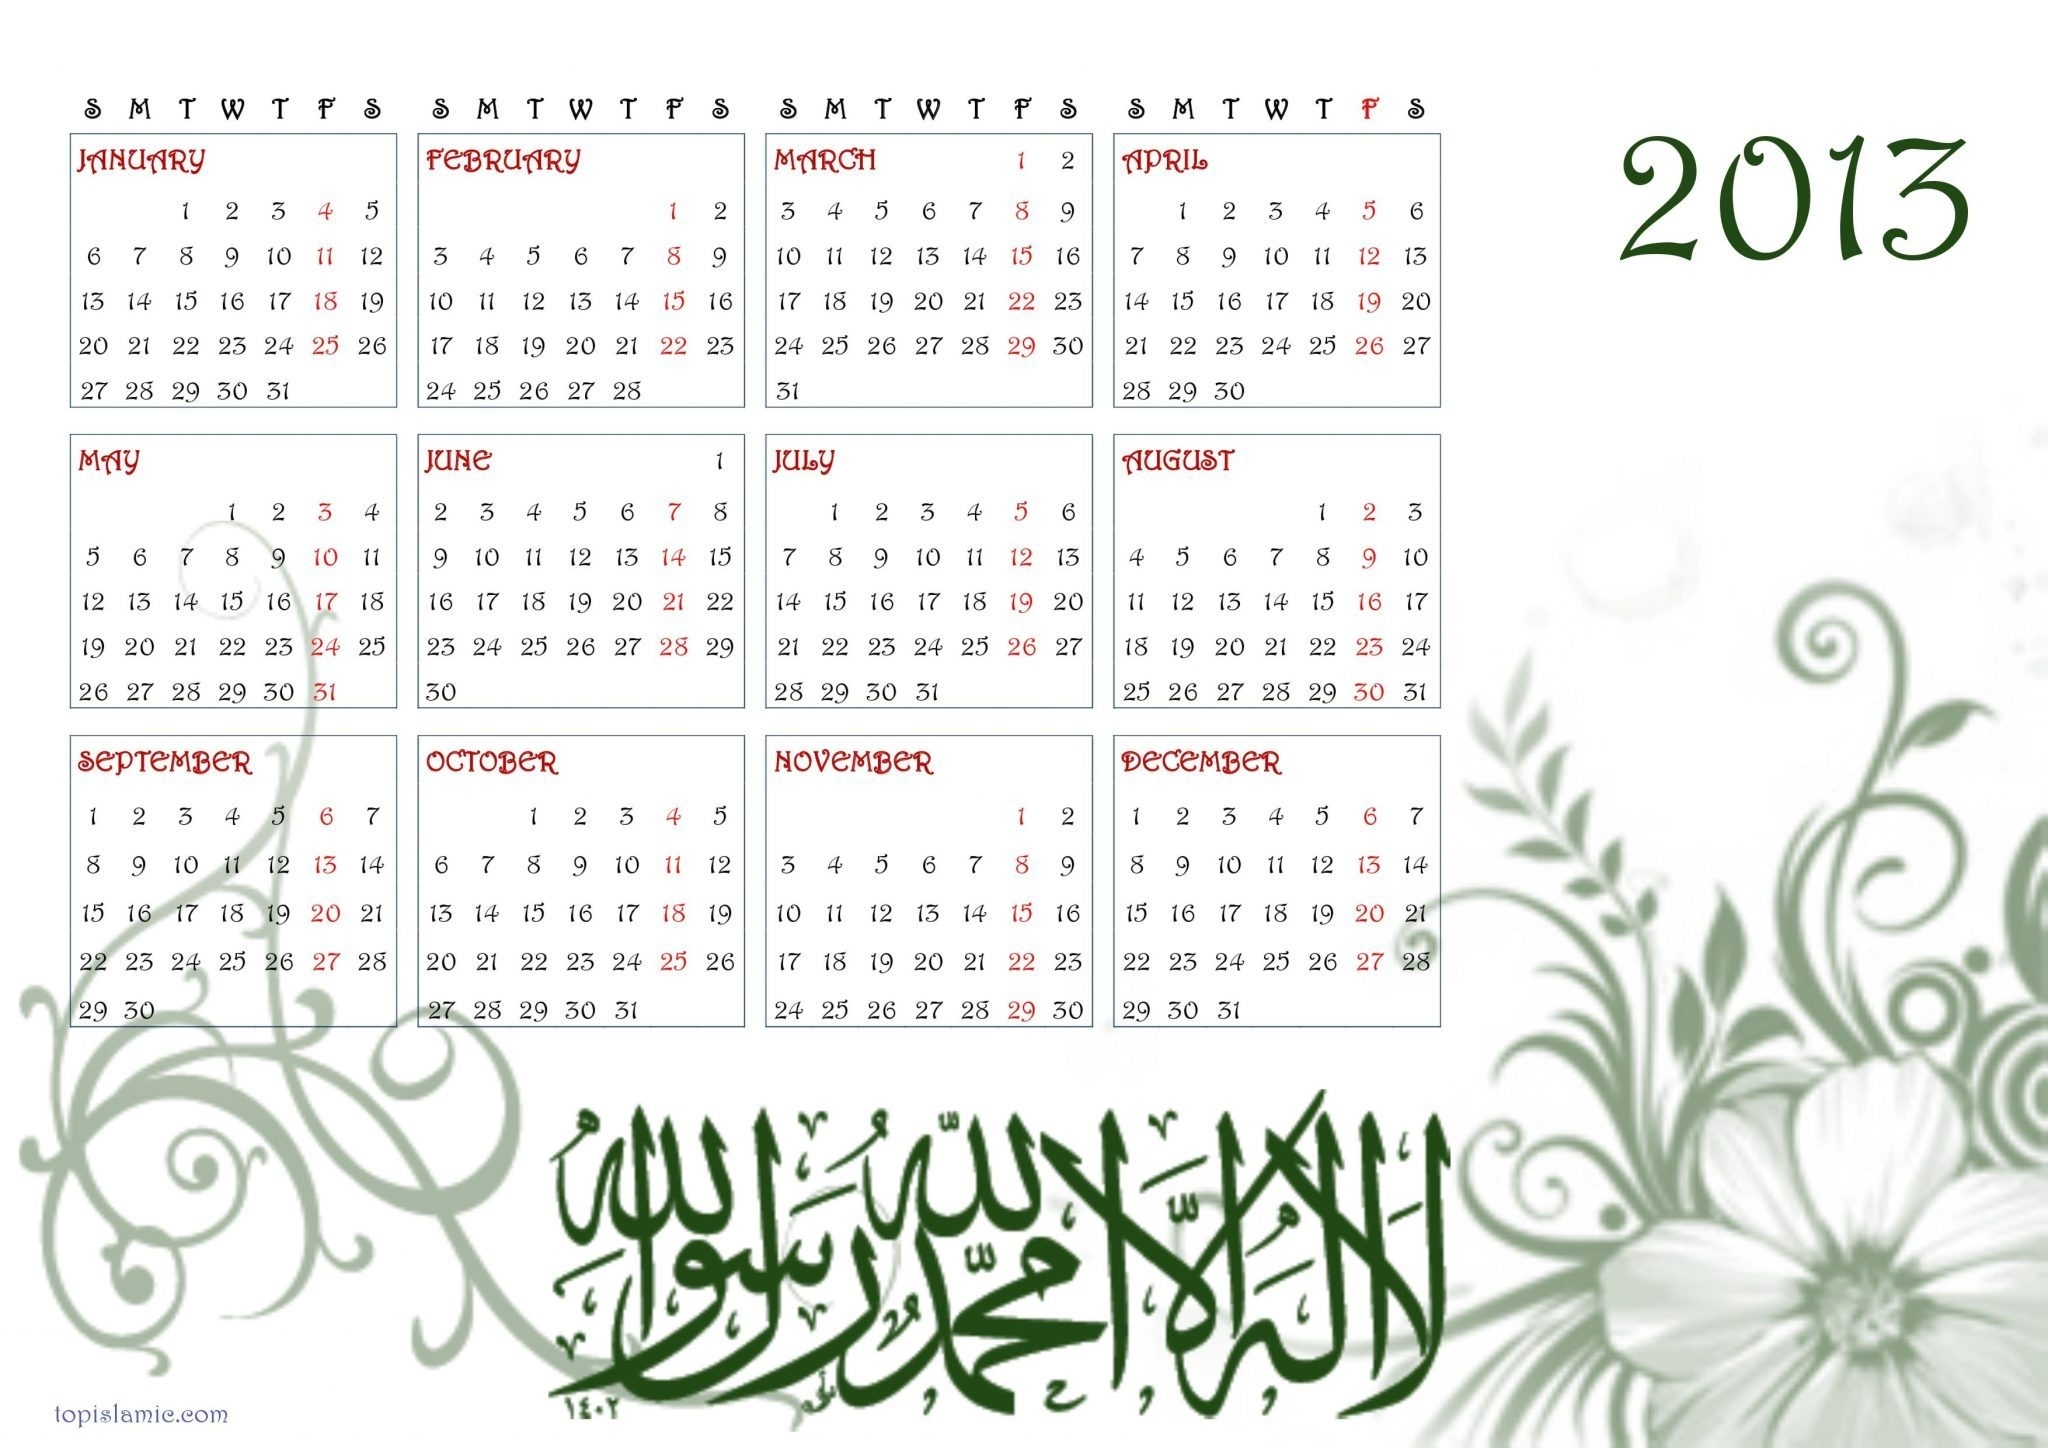 Hijri Calendar July 2015 | Calendar Clock For Dementia intended for Islamic Calendar 2015 Pdf Free Download